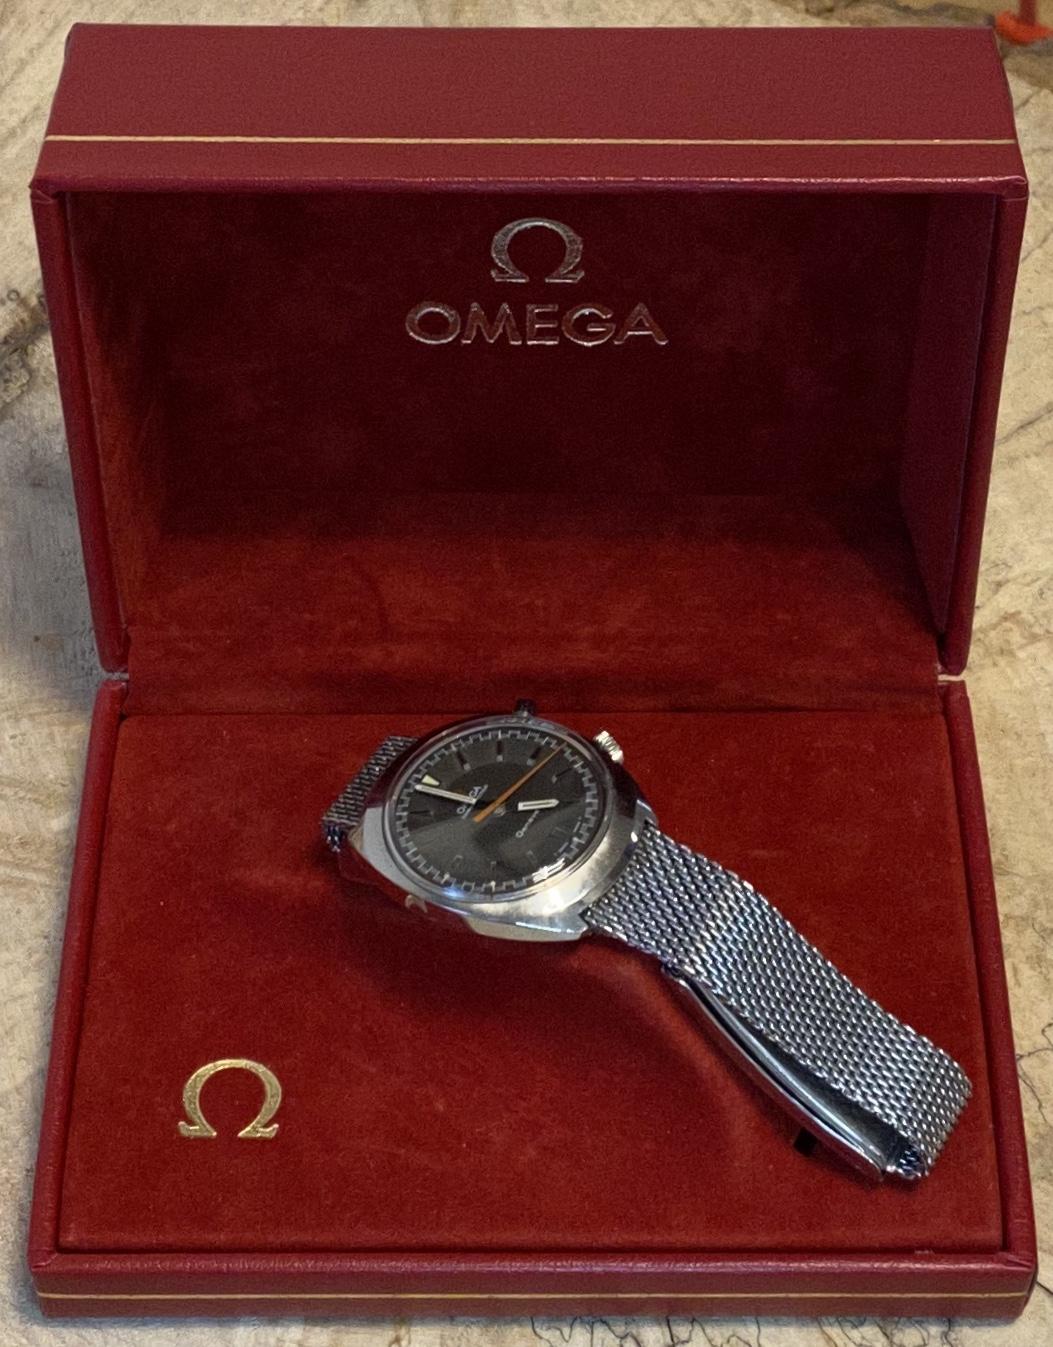 Lot 1 - Omega. Chronostop 145.009 (Manual Wind) *12 month guarantee*